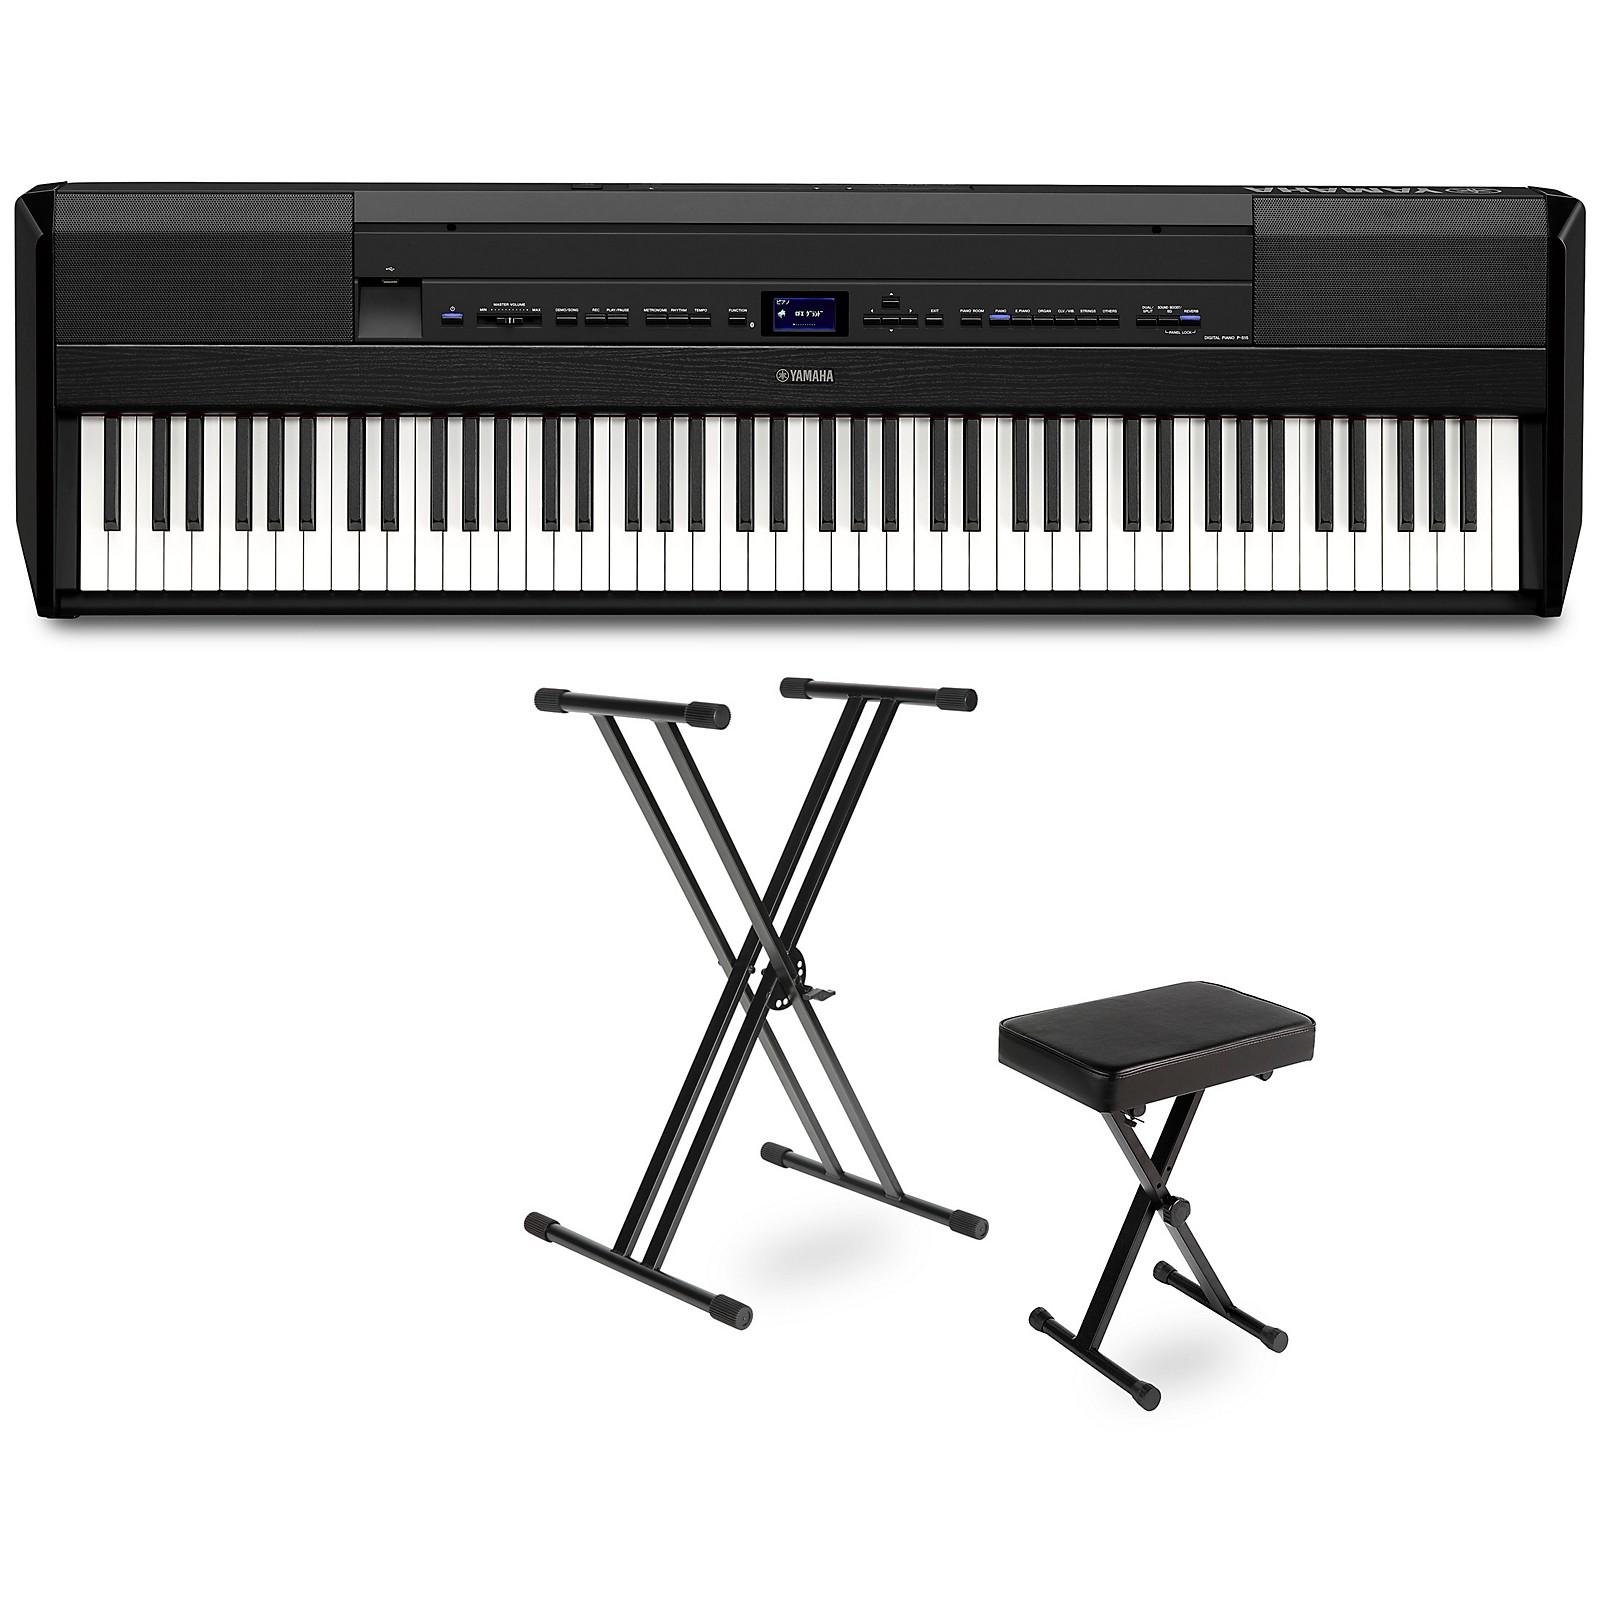 Yamaha P-515 Digital Piano Package